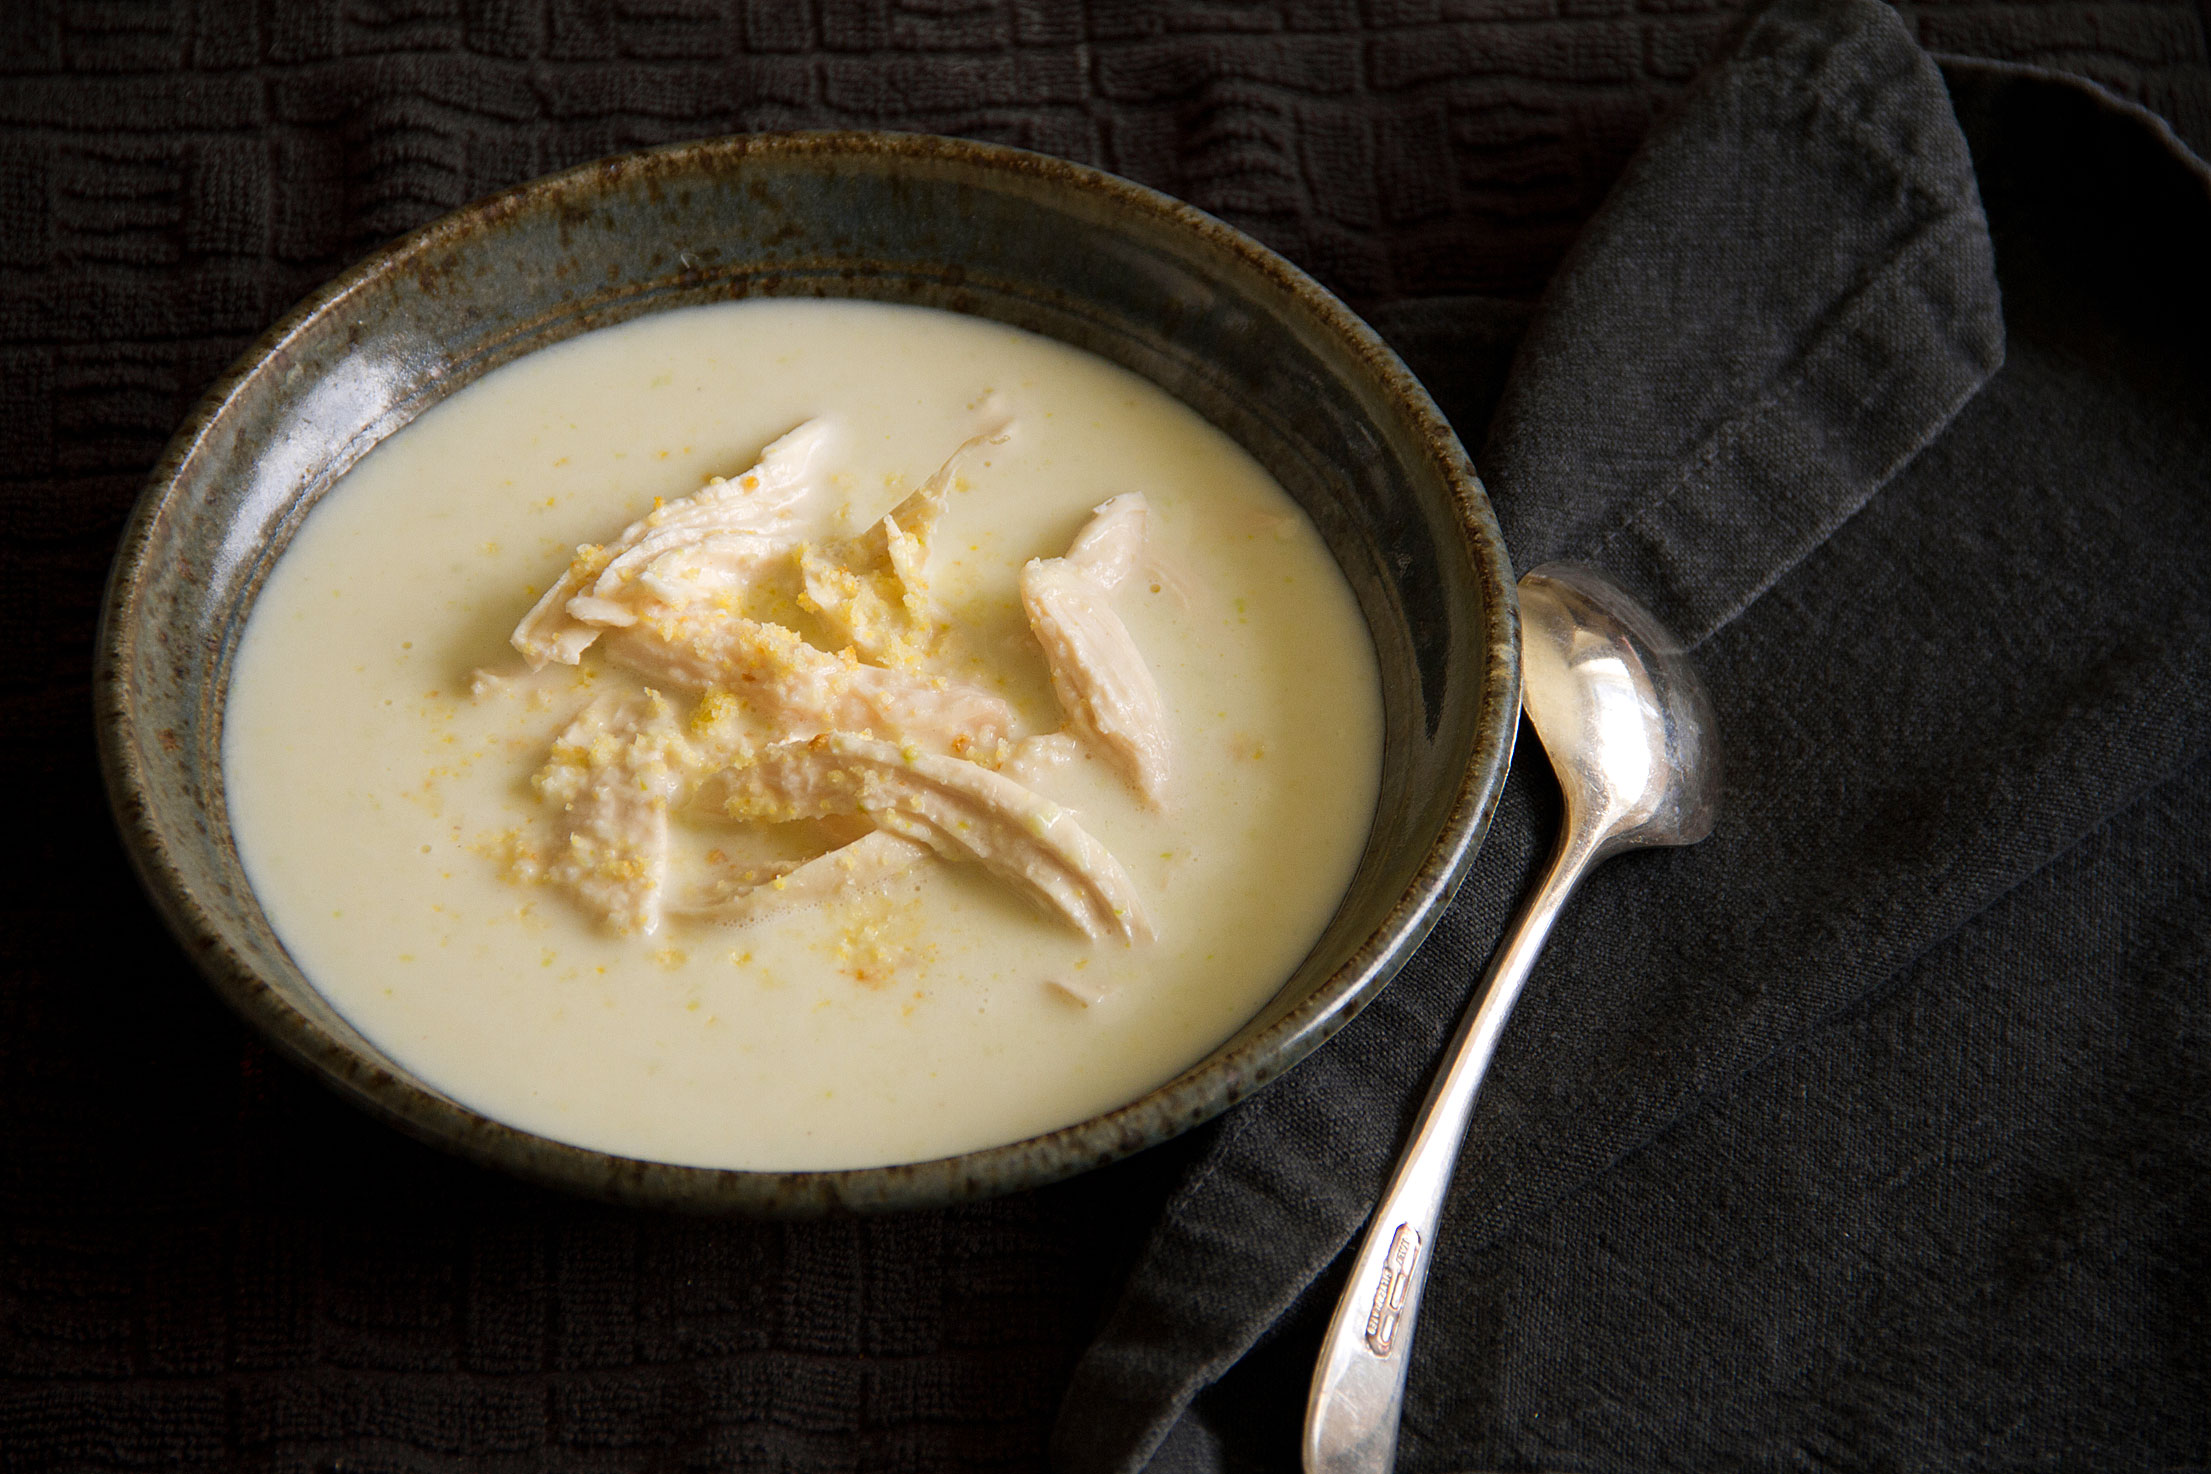 Chicken and Cornbread Buttermilk Soup